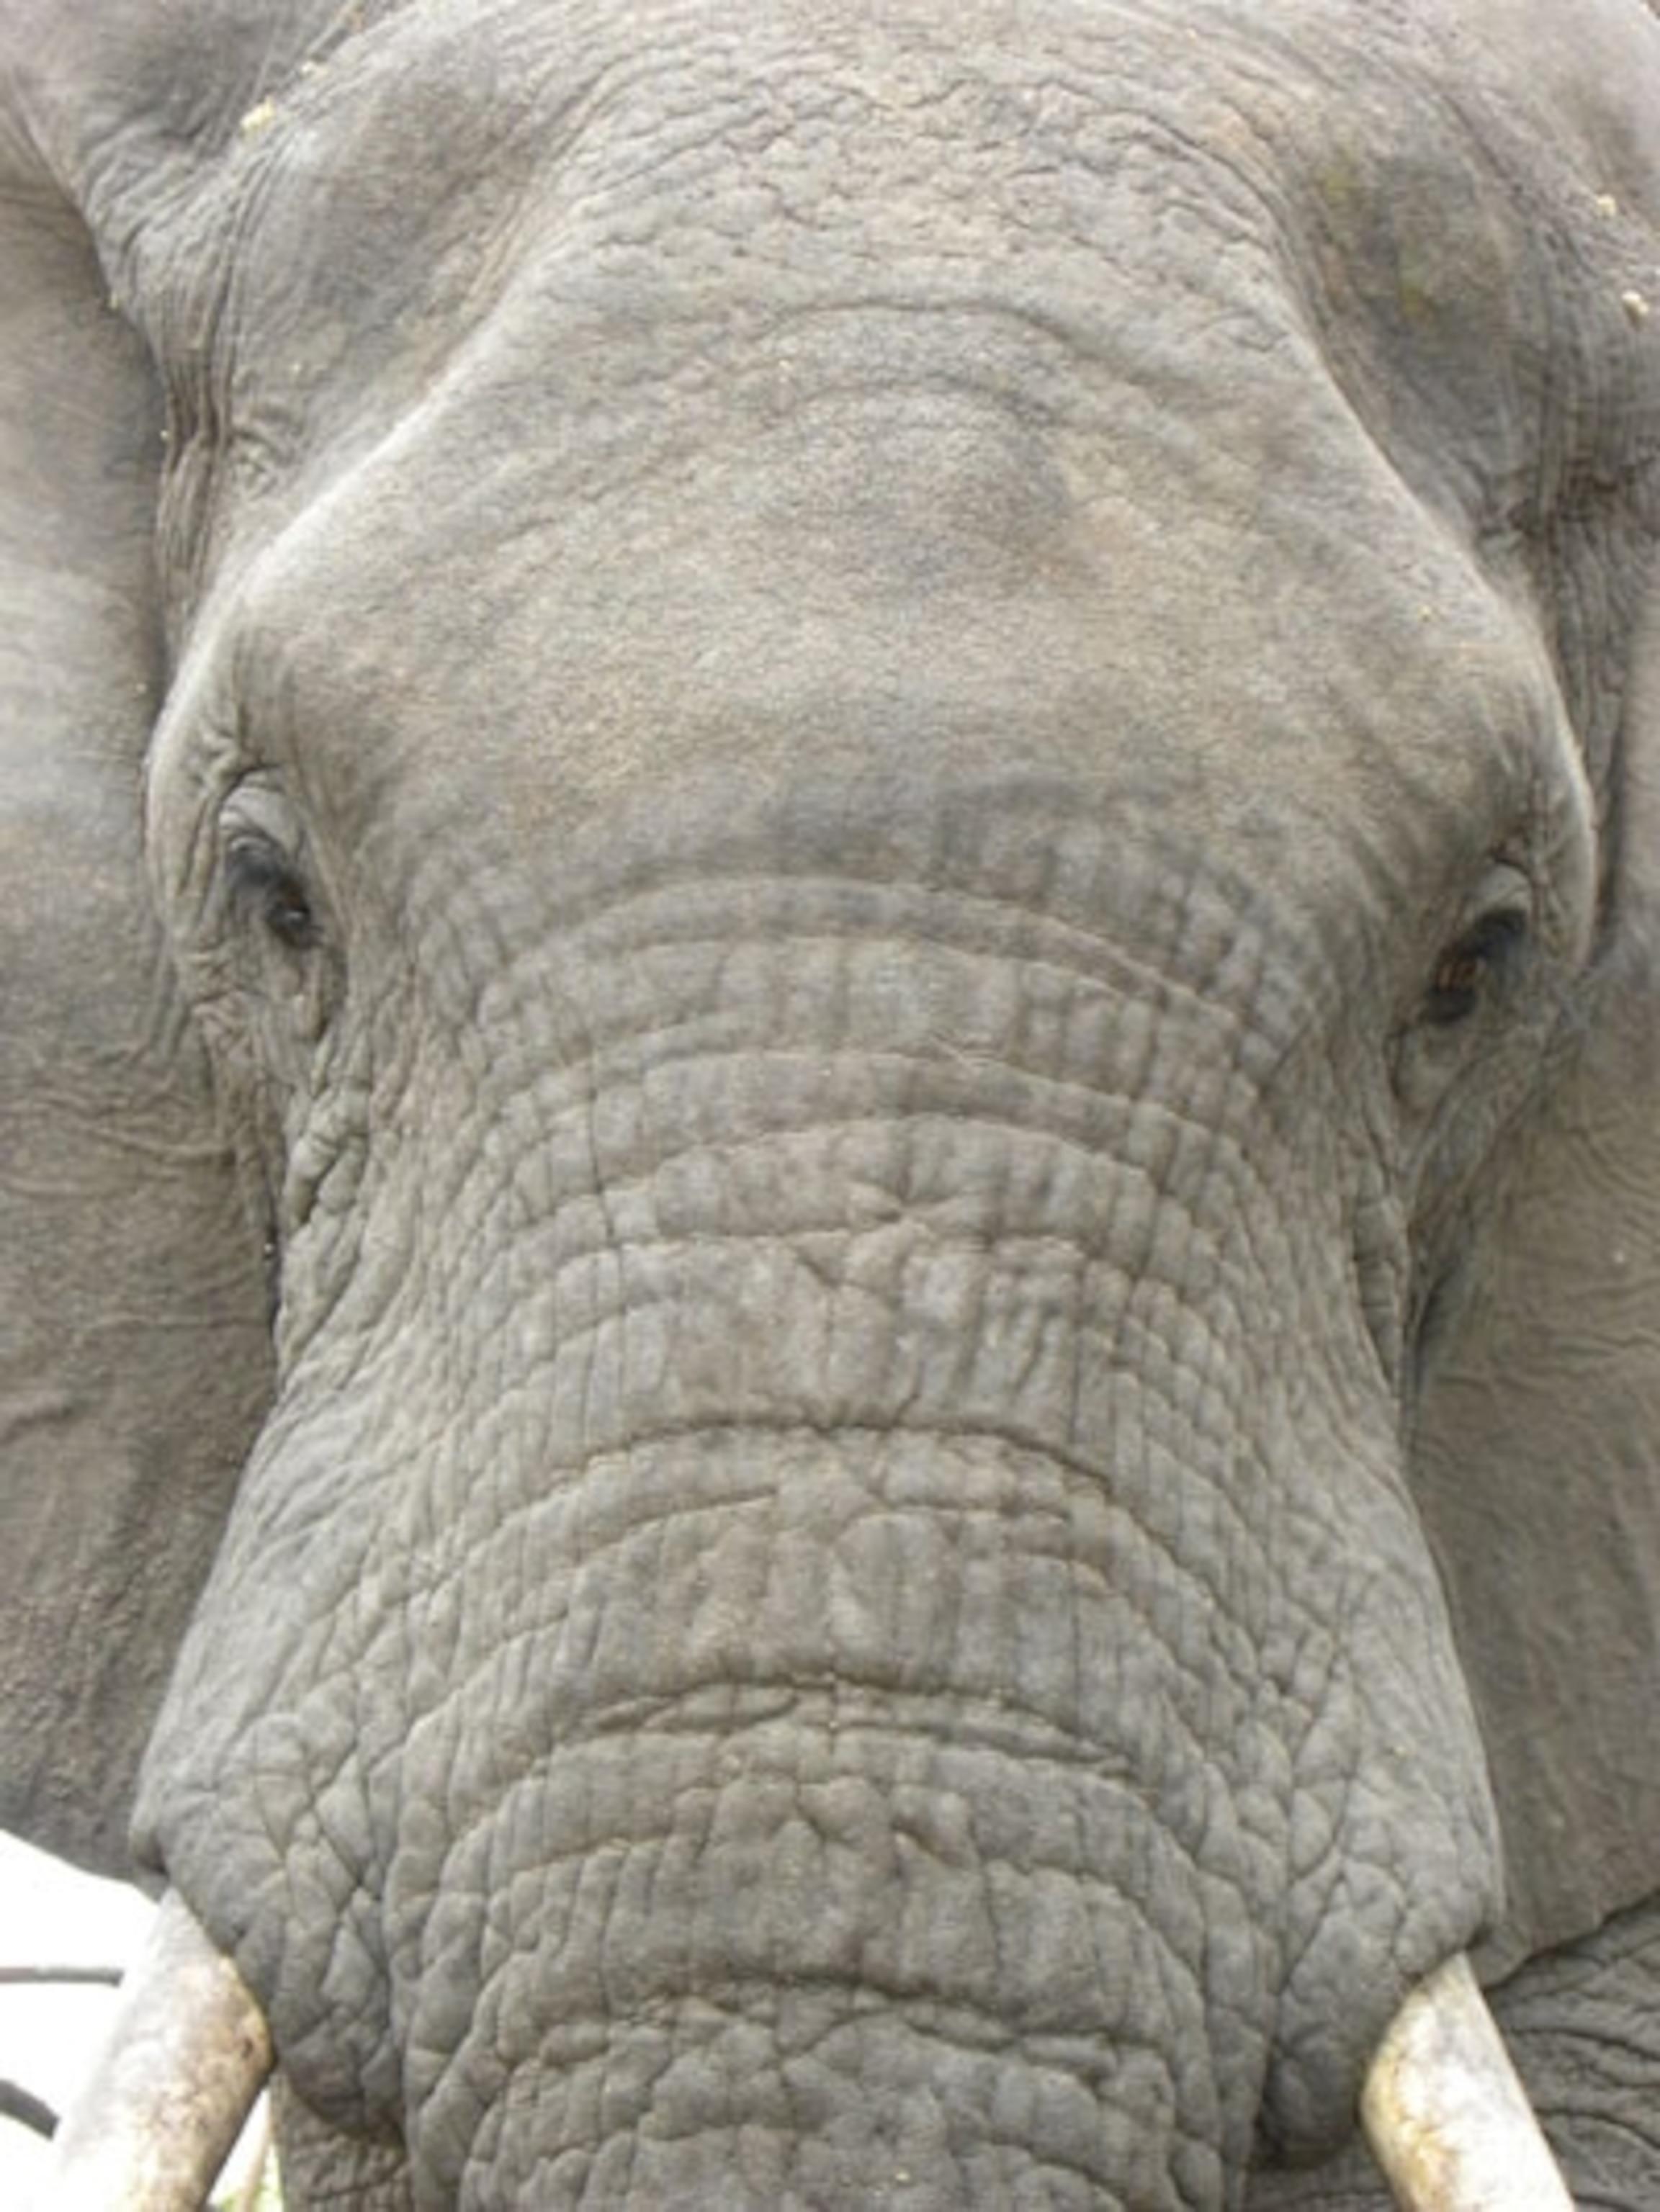 Dick elephant Penis